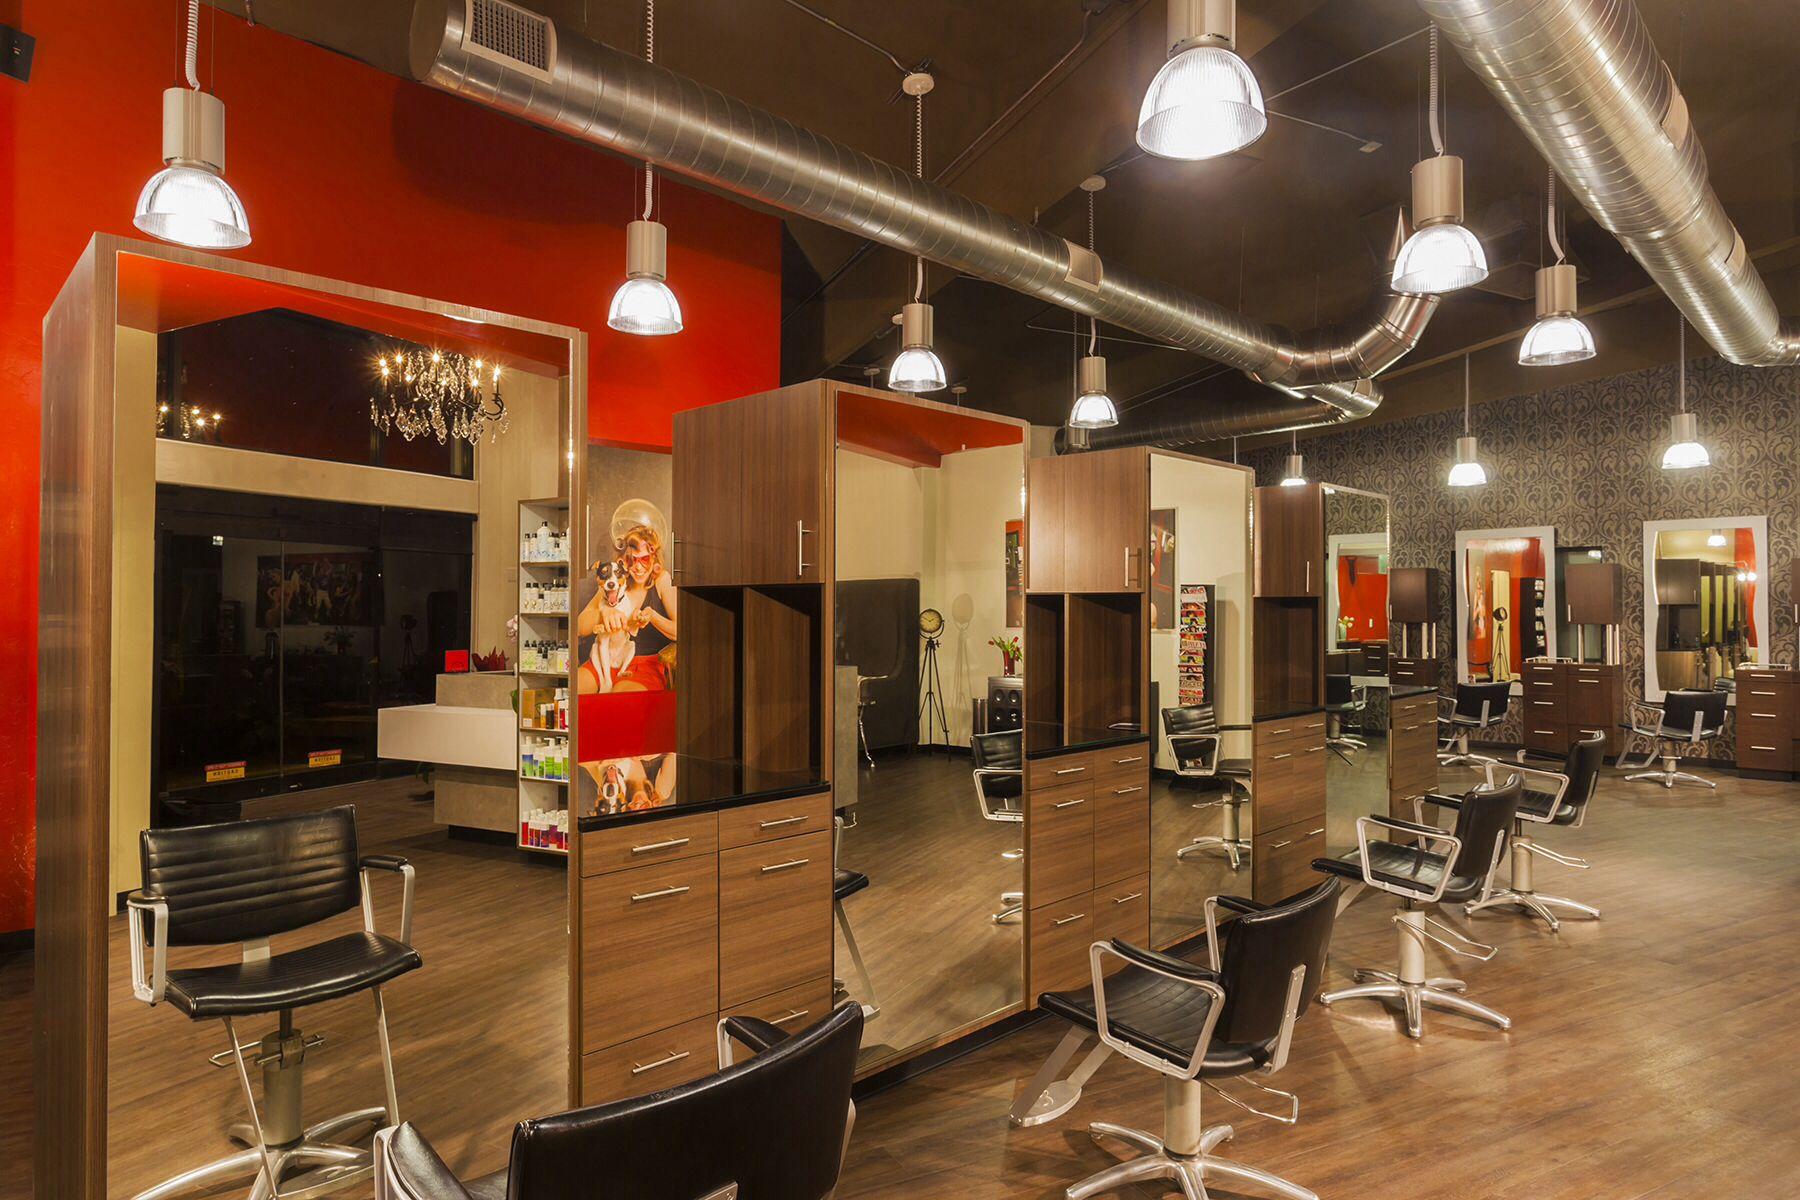 Hair salon decoration idea  Salon interior design, Beauty salon